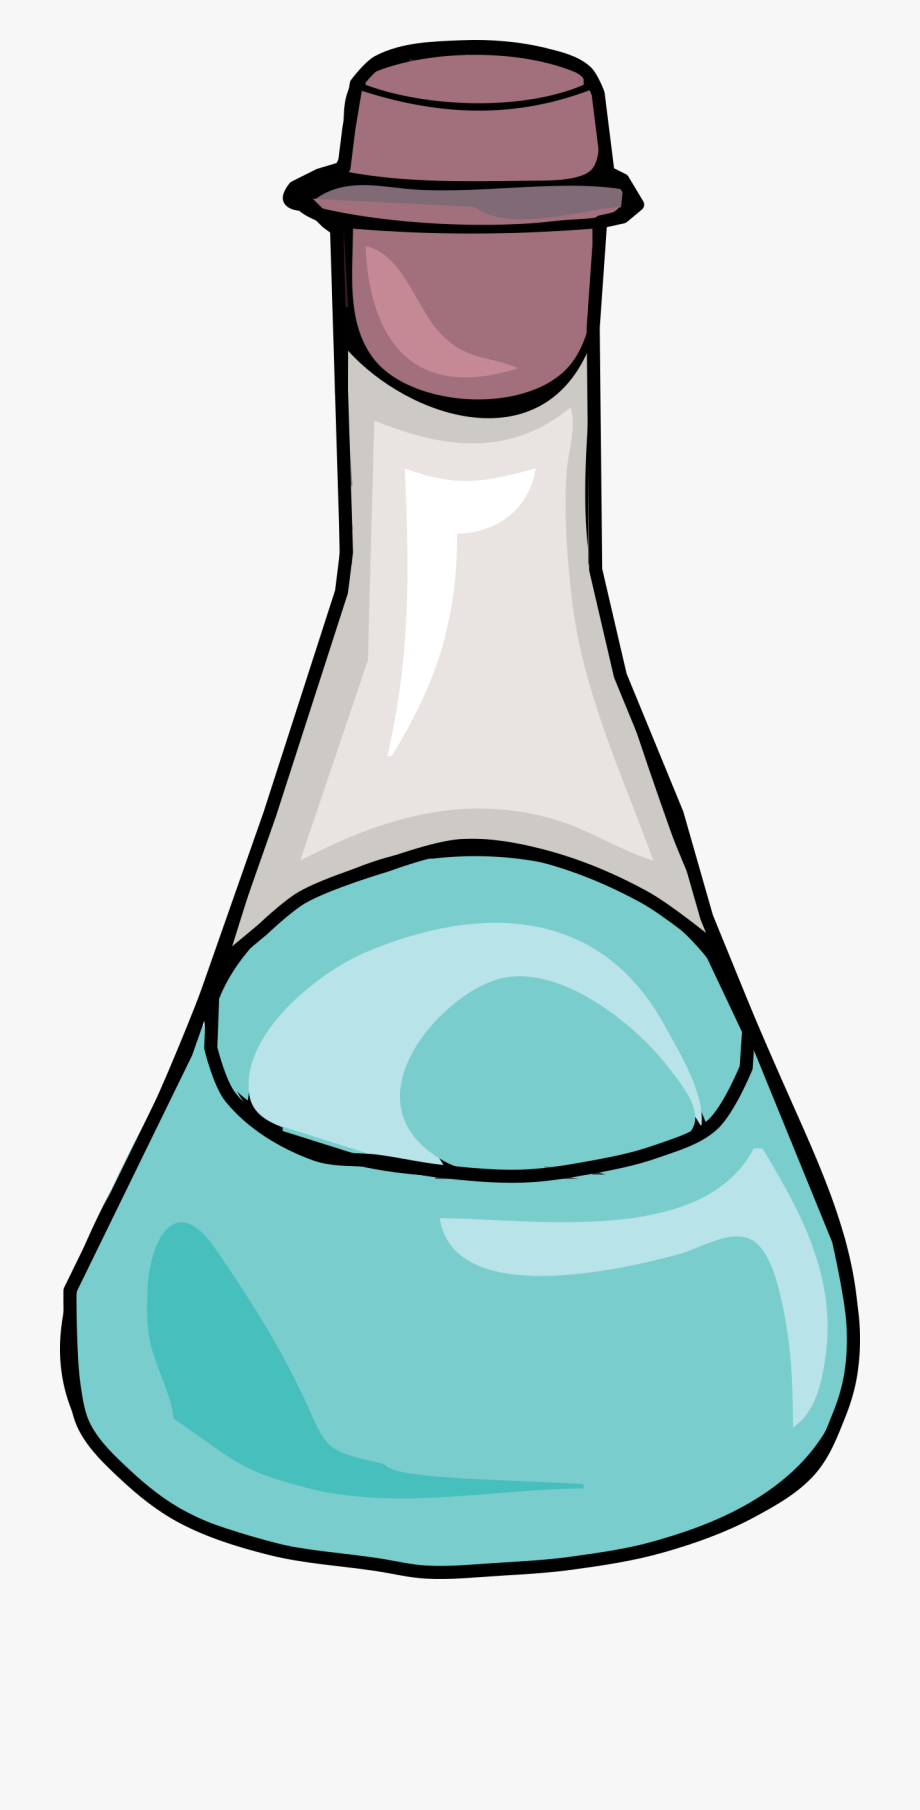 Beaker clipart scientist beaker. Science bottle png free